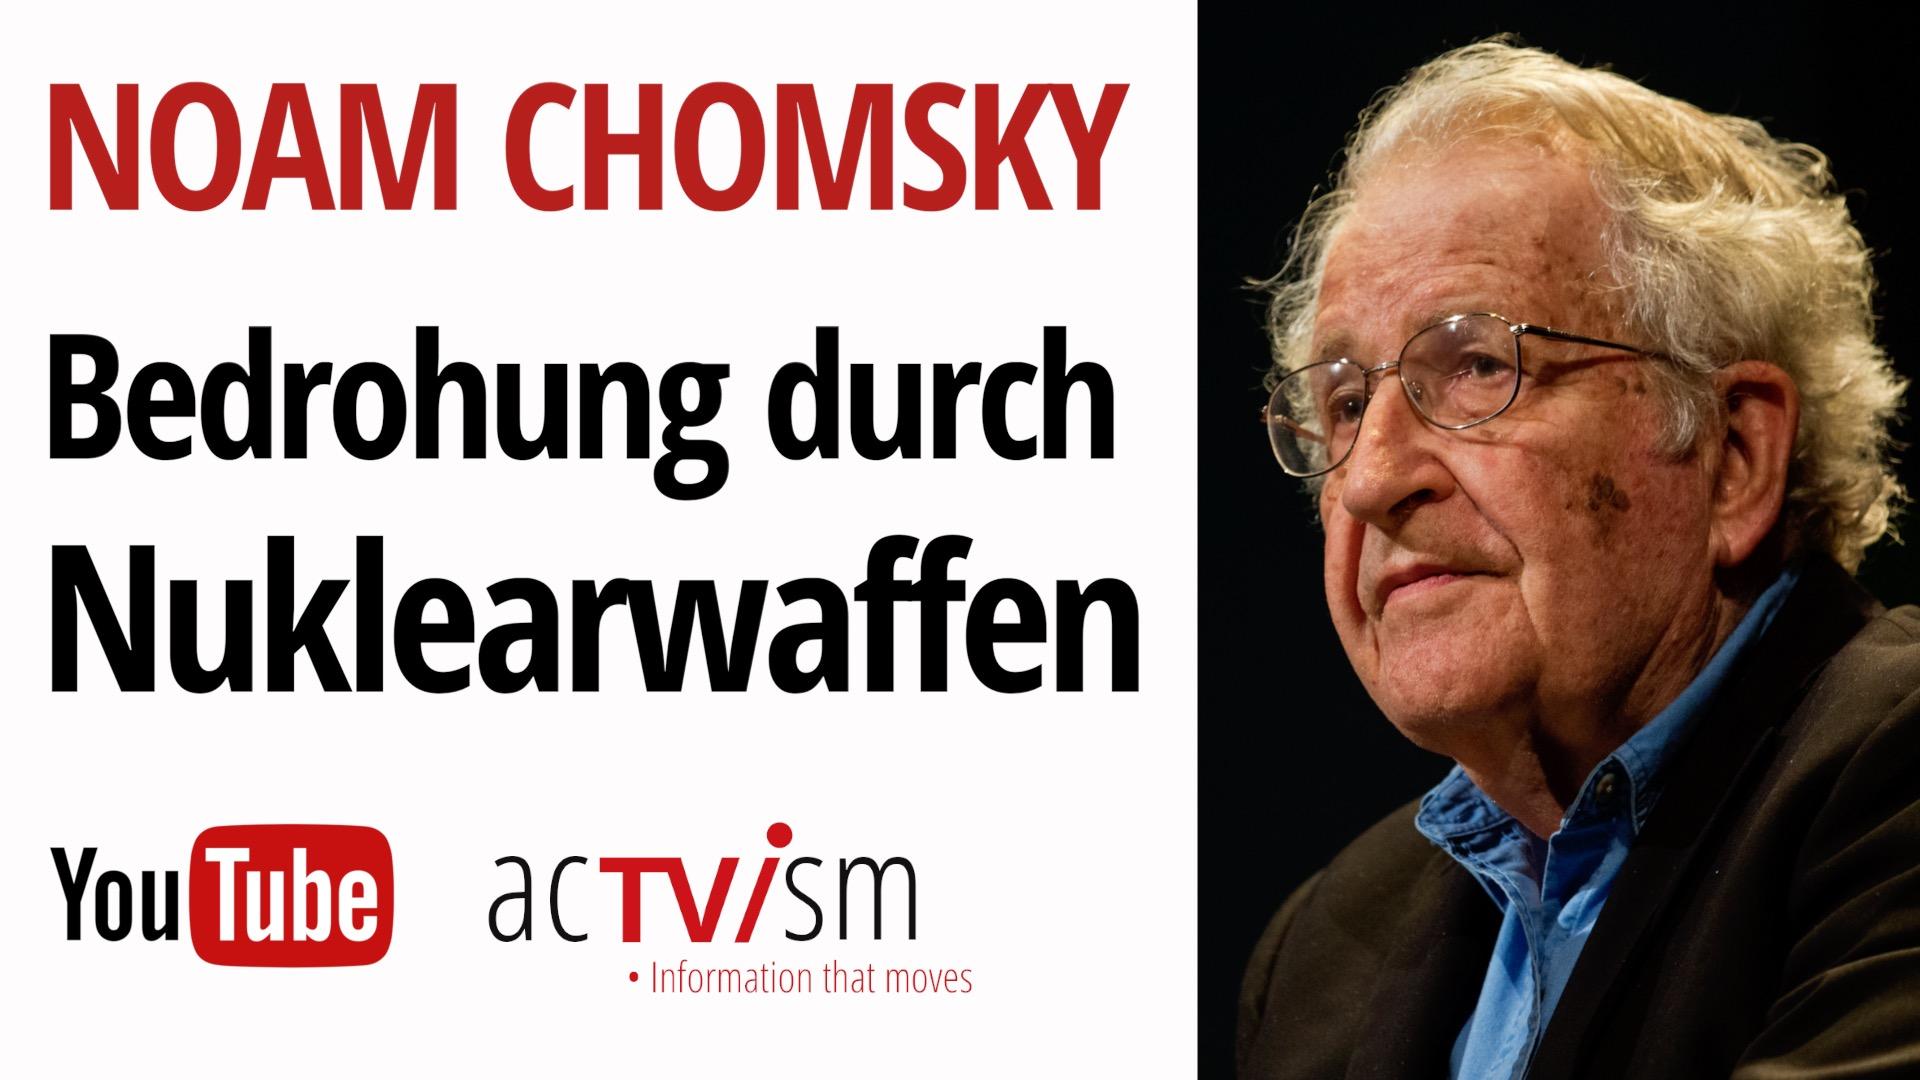 Die Bedrohung durch Nuklearwaffen mit Noam Chomsky